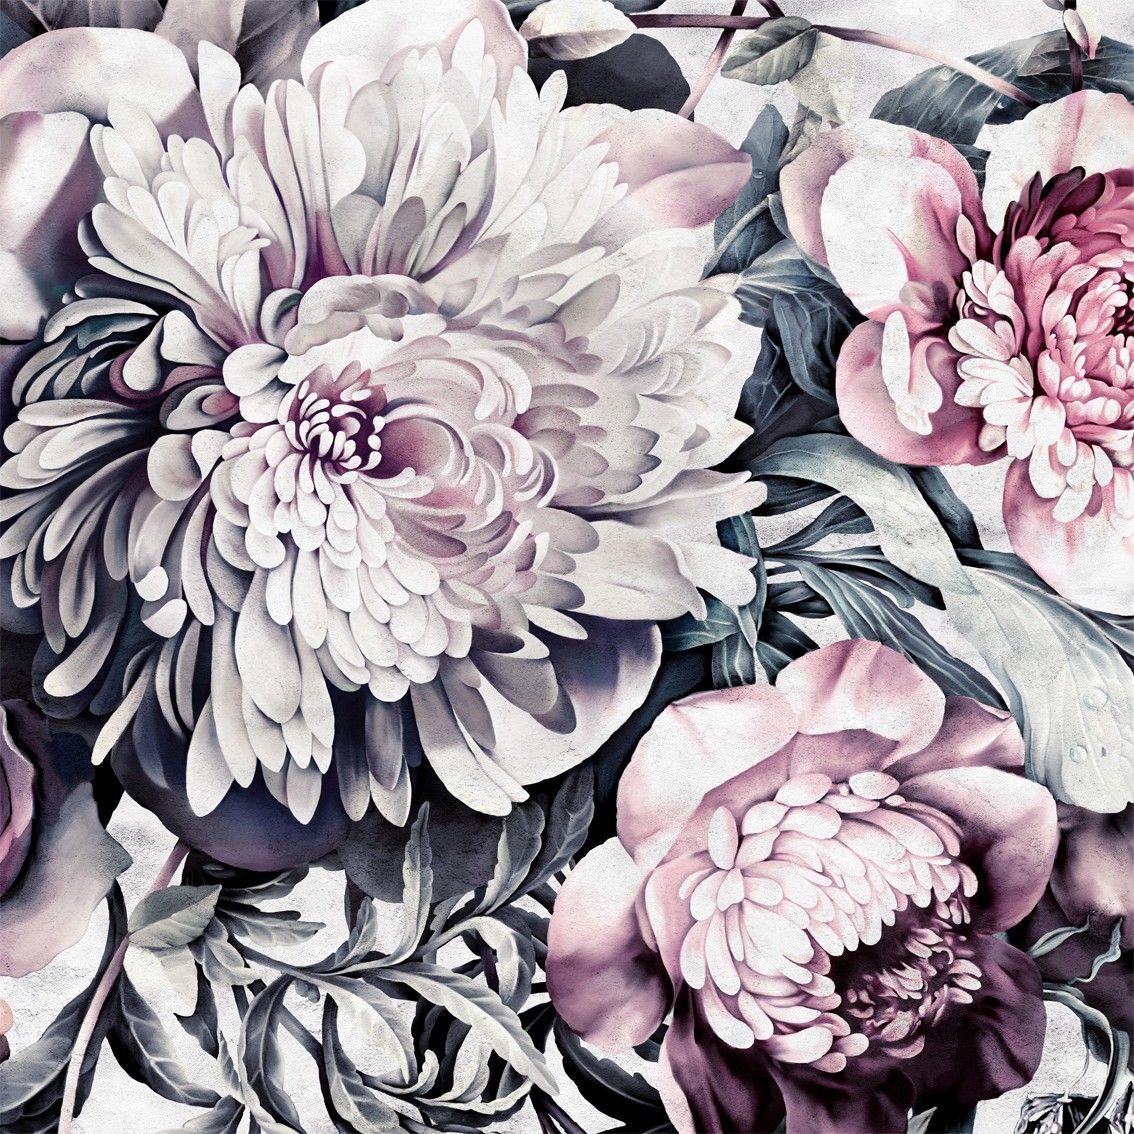 Black floral print wallpaper dark floral wallpaper by ellie cashman - Dark Floral Ii Sanded Fresco Floral Wallpaper By Ellie Cashman Design